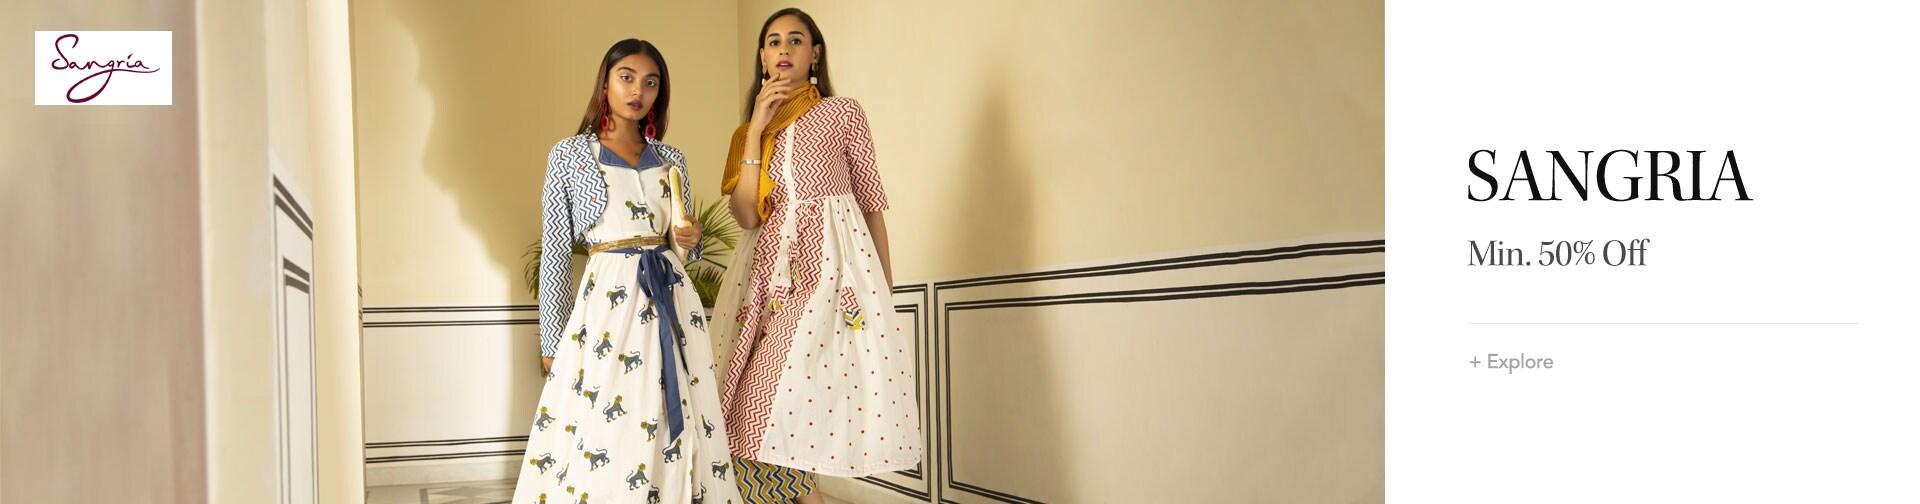 myntra.com - Flat 50% Discount on Sangria Women's Fashion